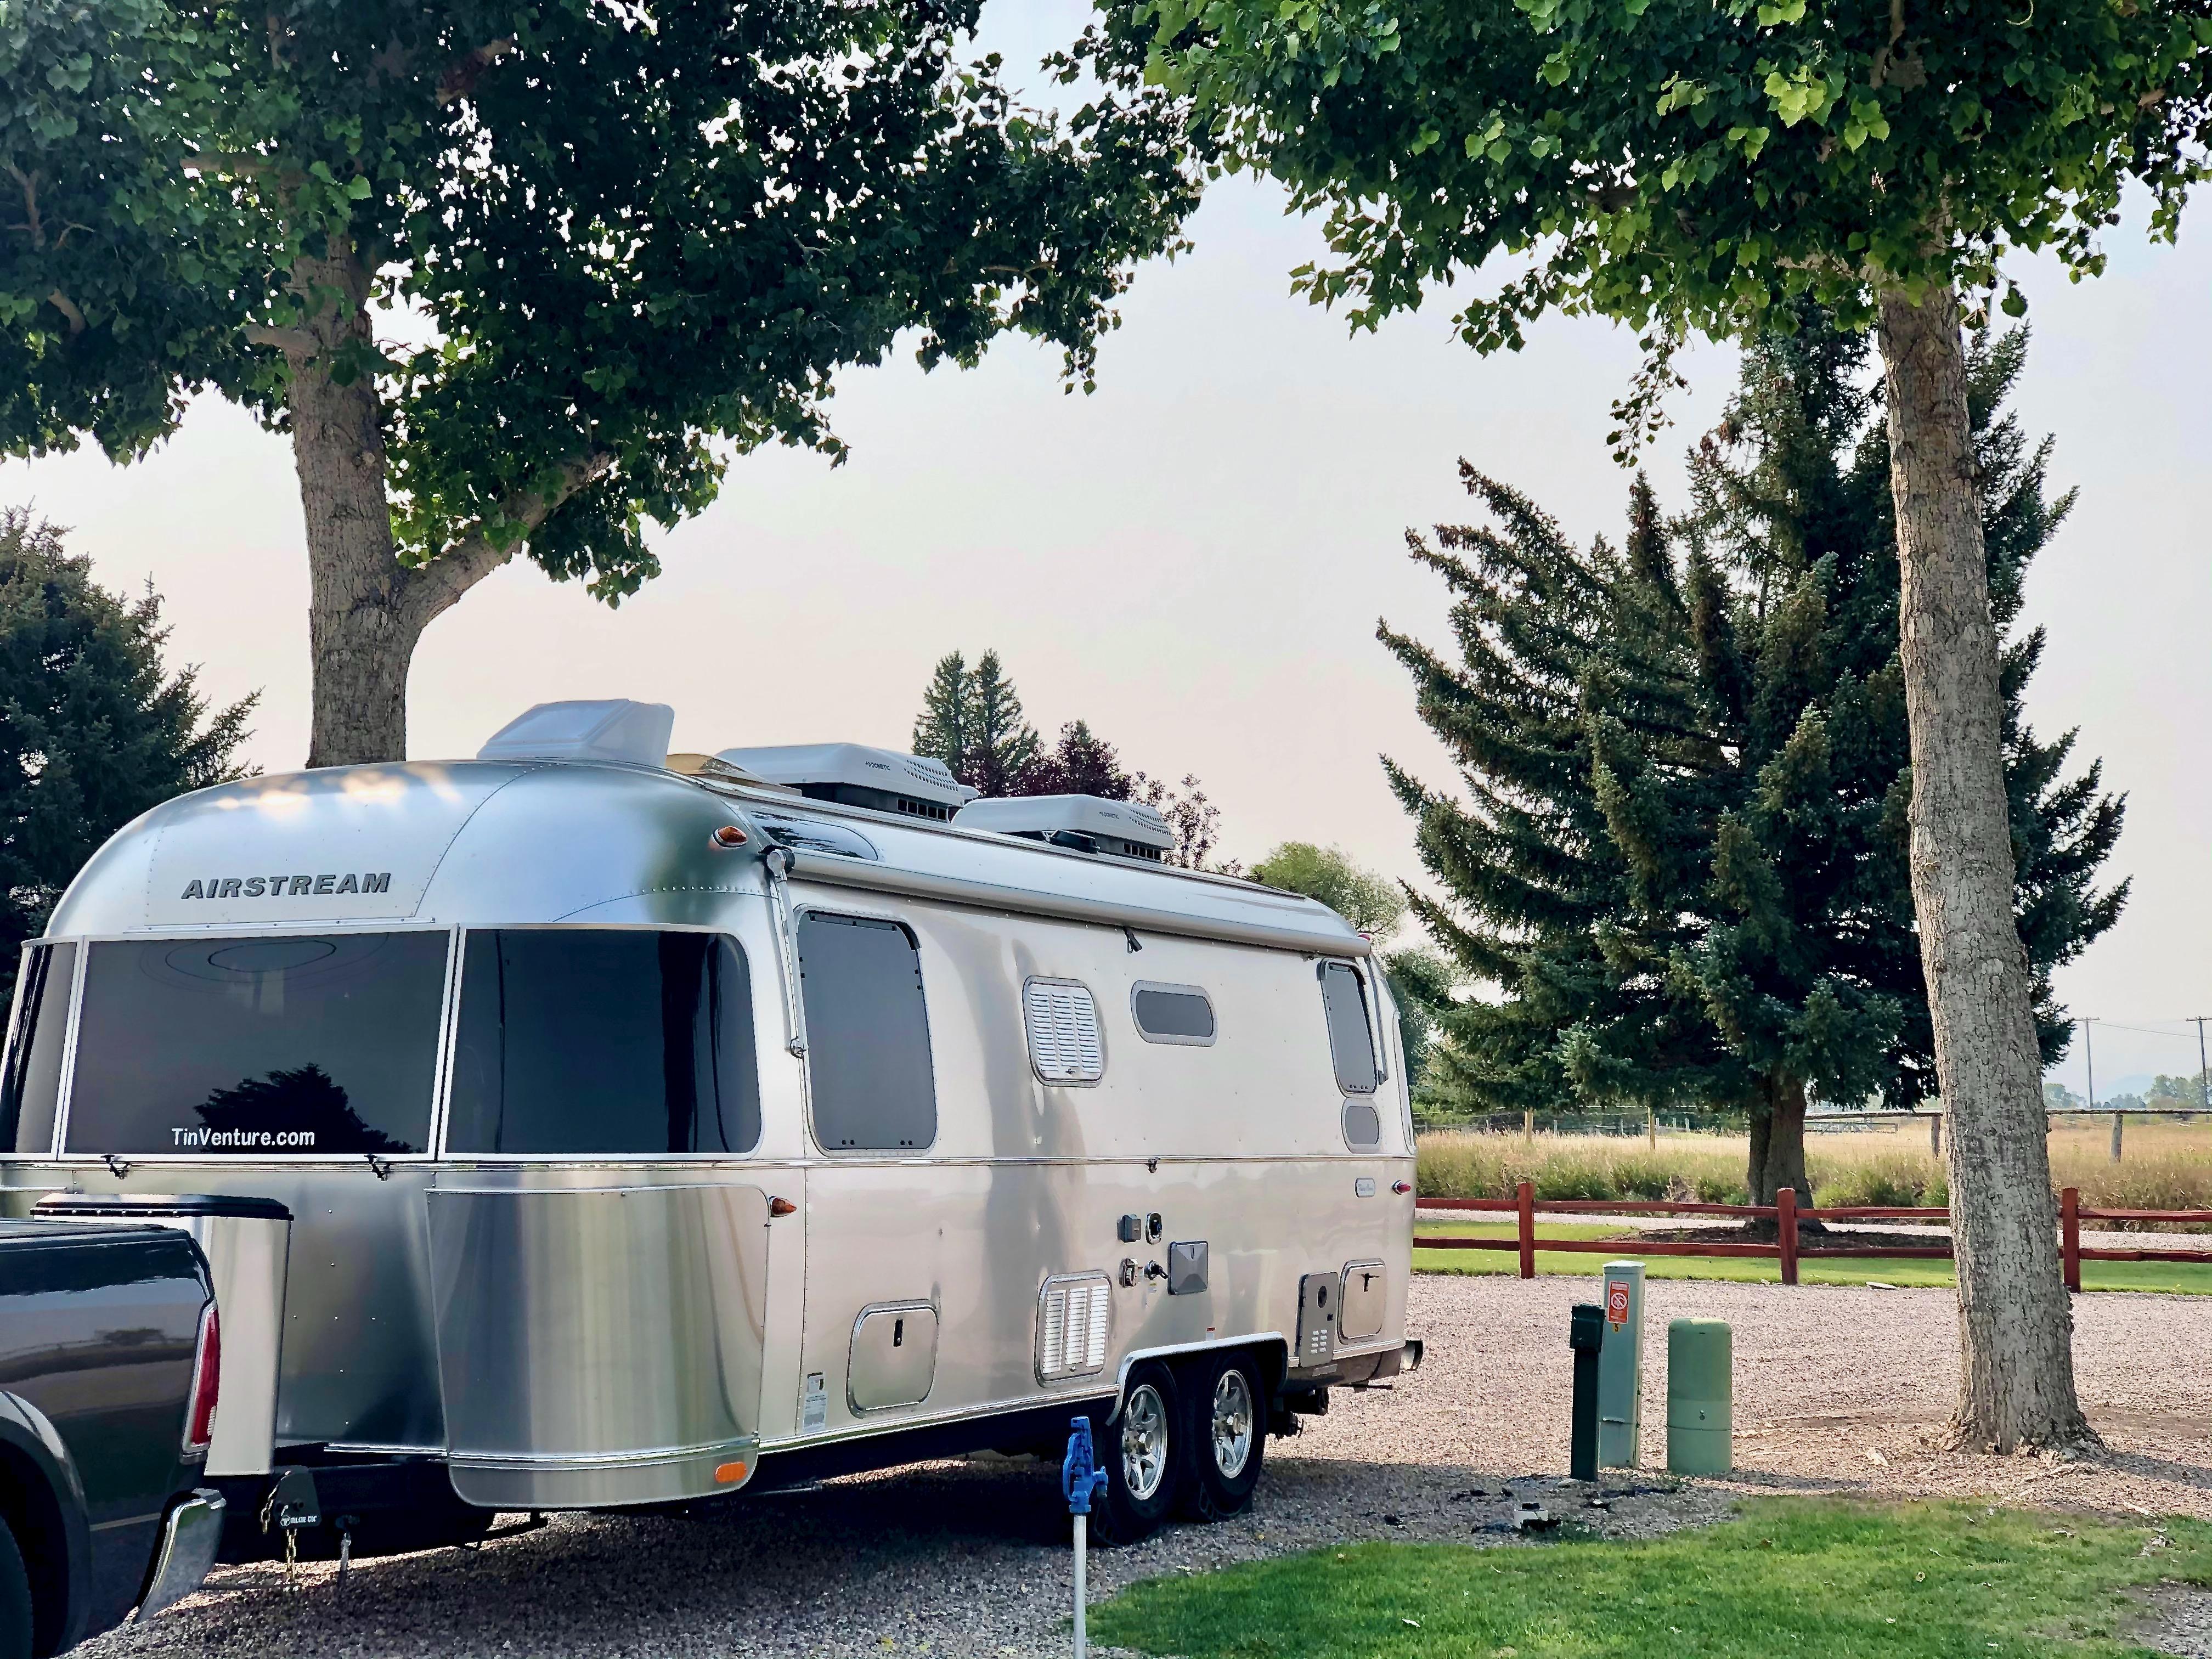 Tamarack RV Park in Couer d'Alene, Idaho. Airstream Flying Cloud 2021